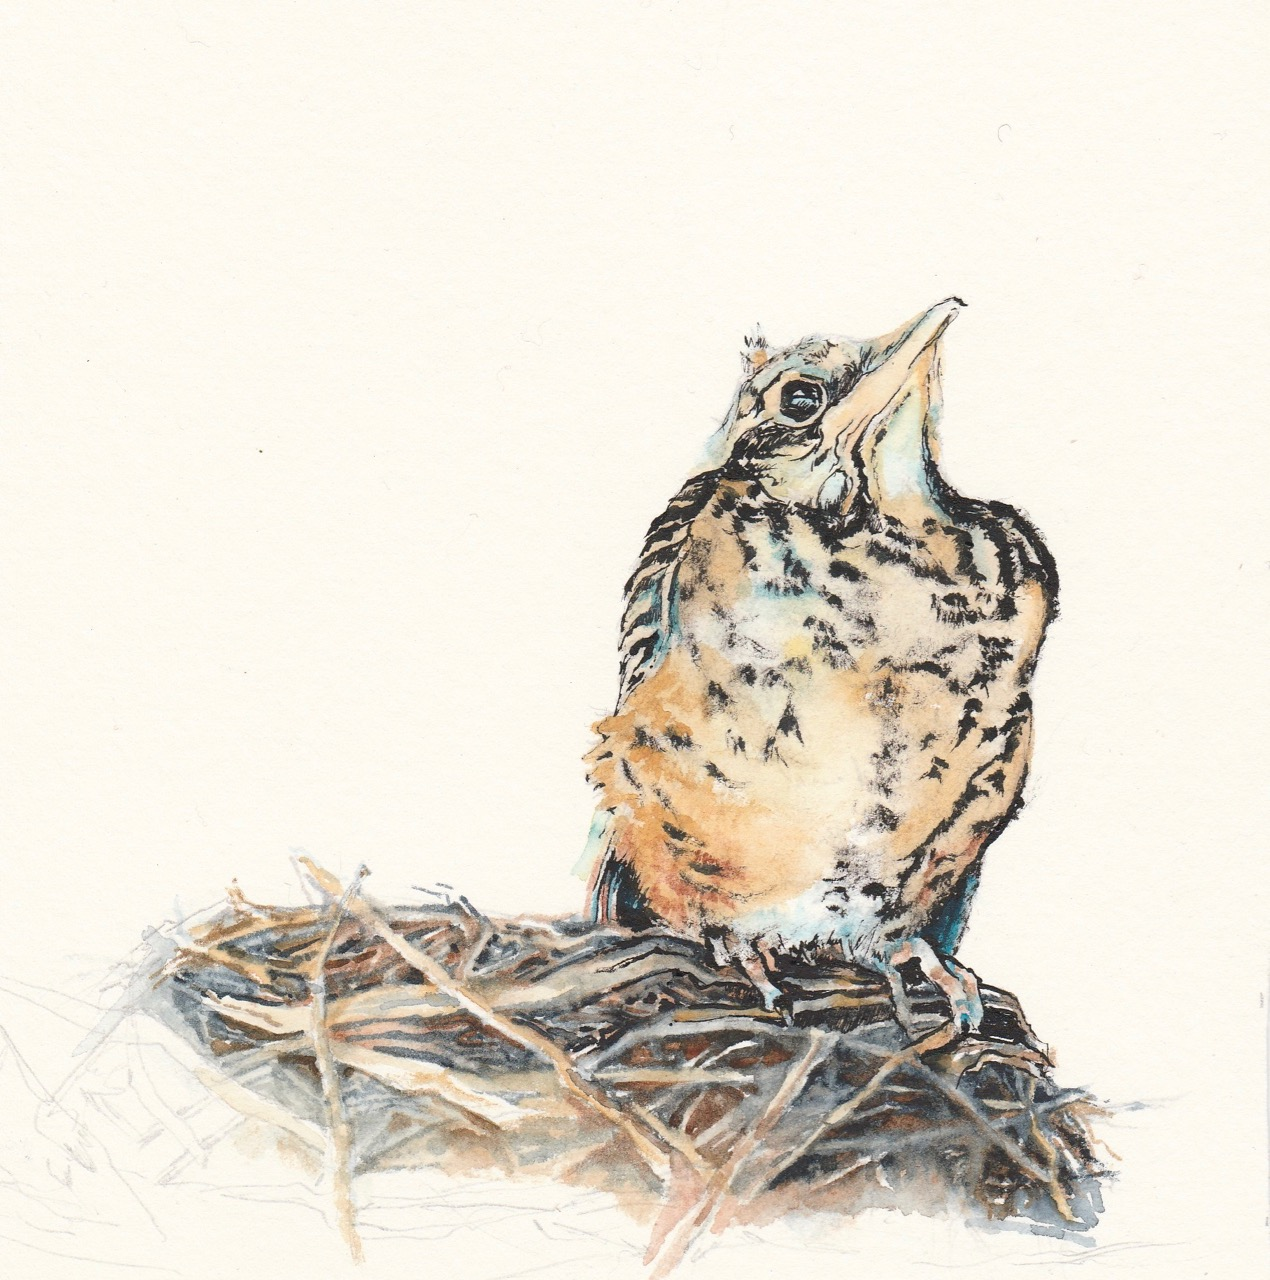 Sketch of robin nestling by Leanne Cadden